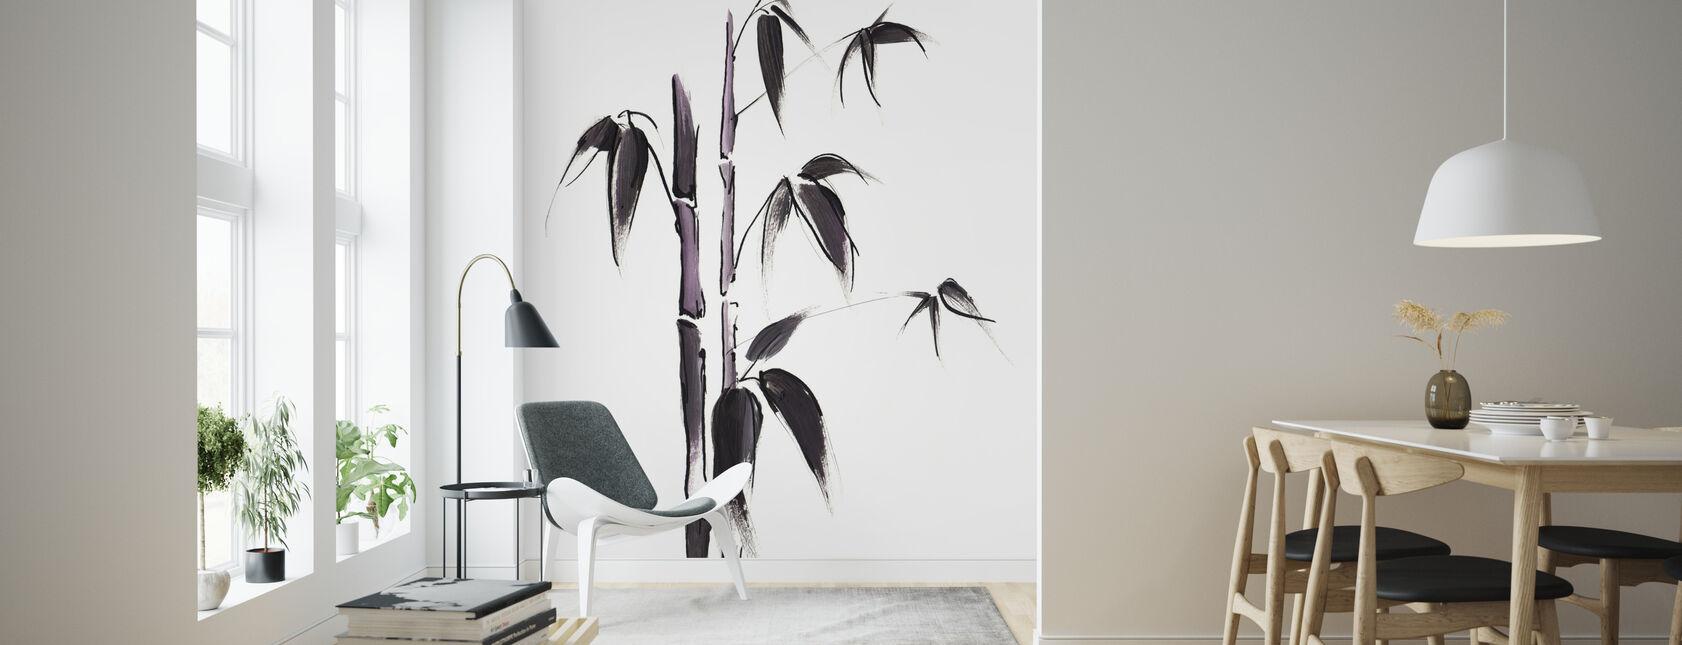 Bamboo Illustration - Wallpaper - Living Room